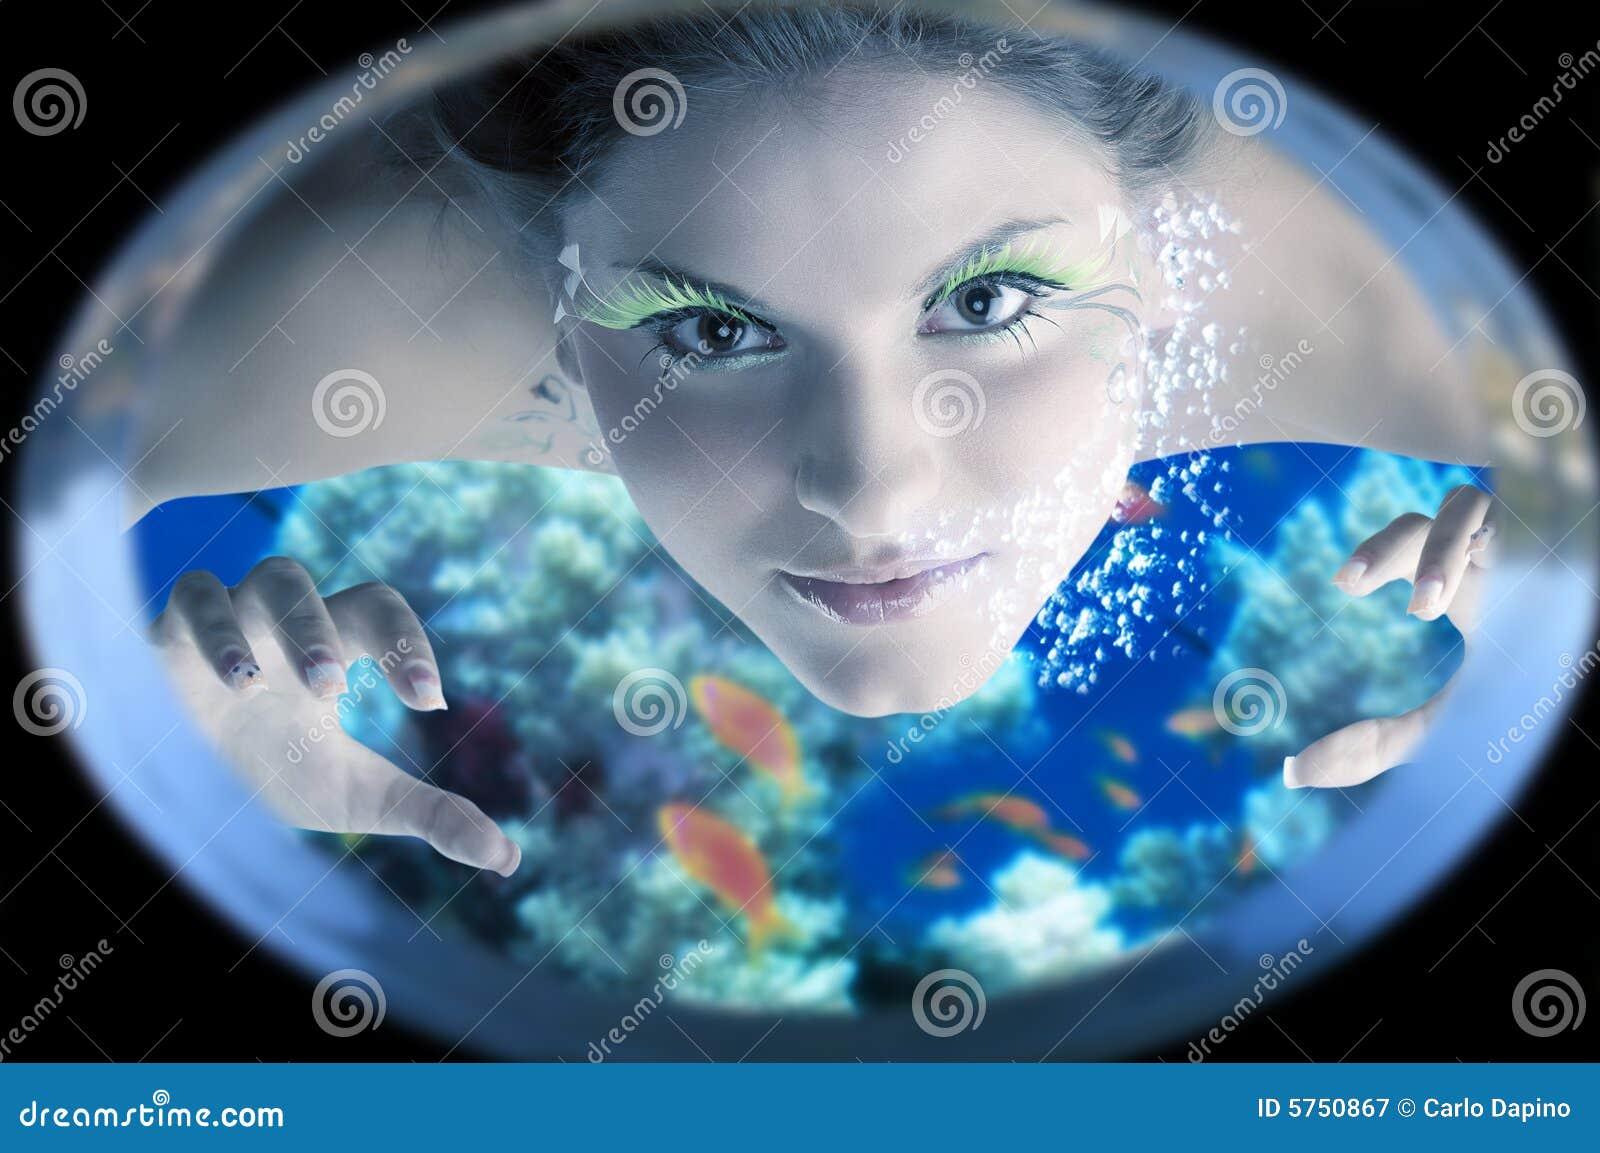 Sirene onder water